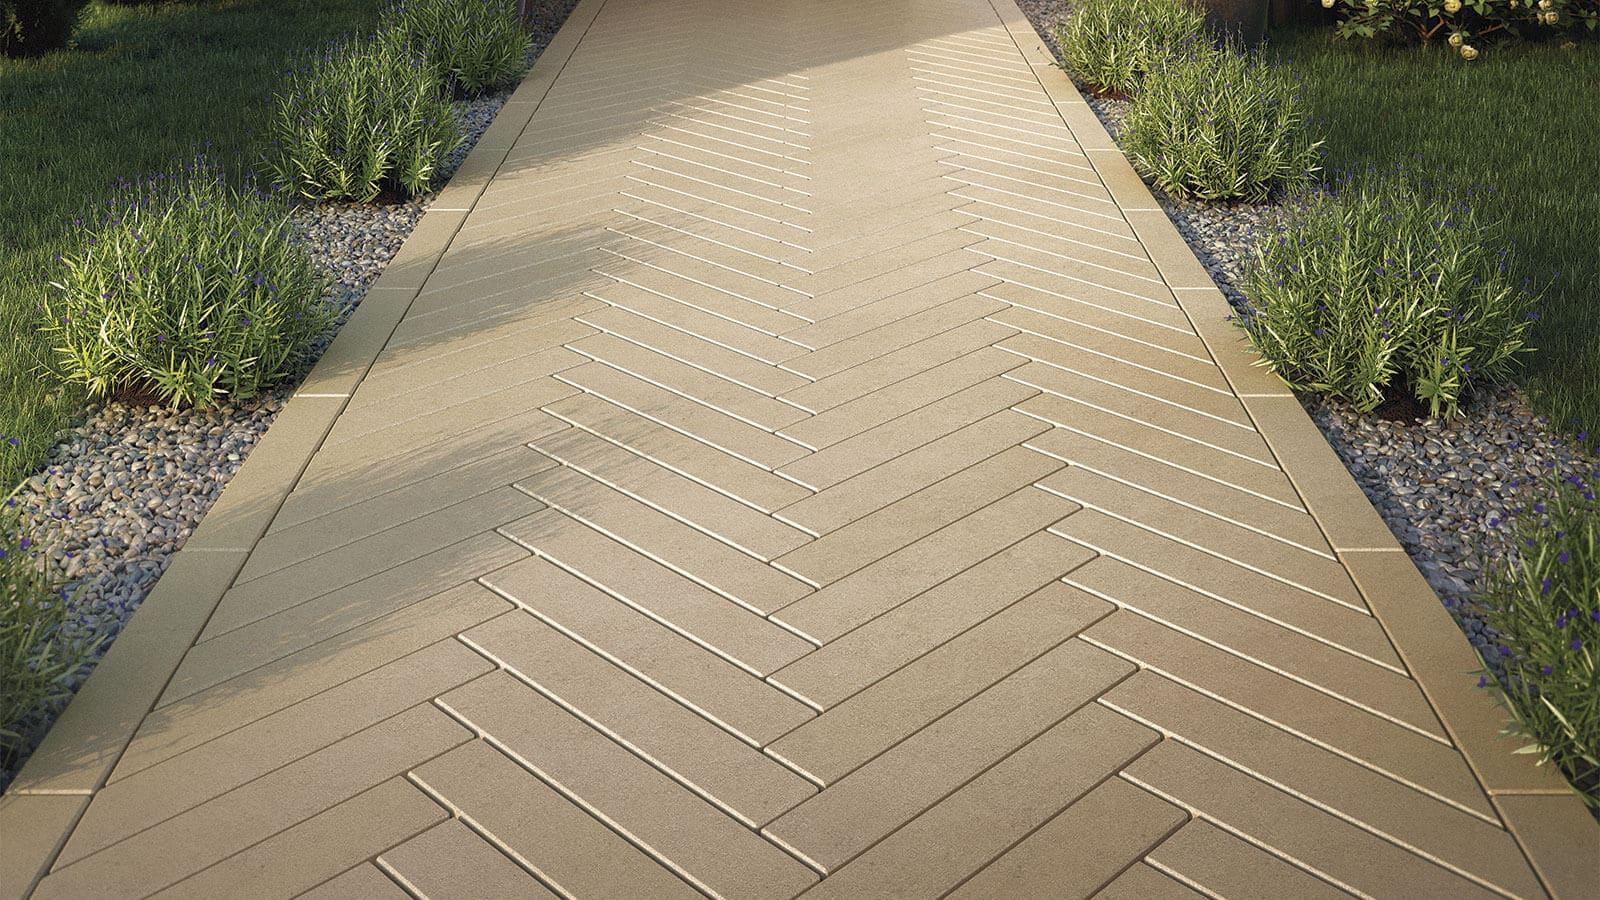 Walkways & Patios 7 - Polycor Hardscapes